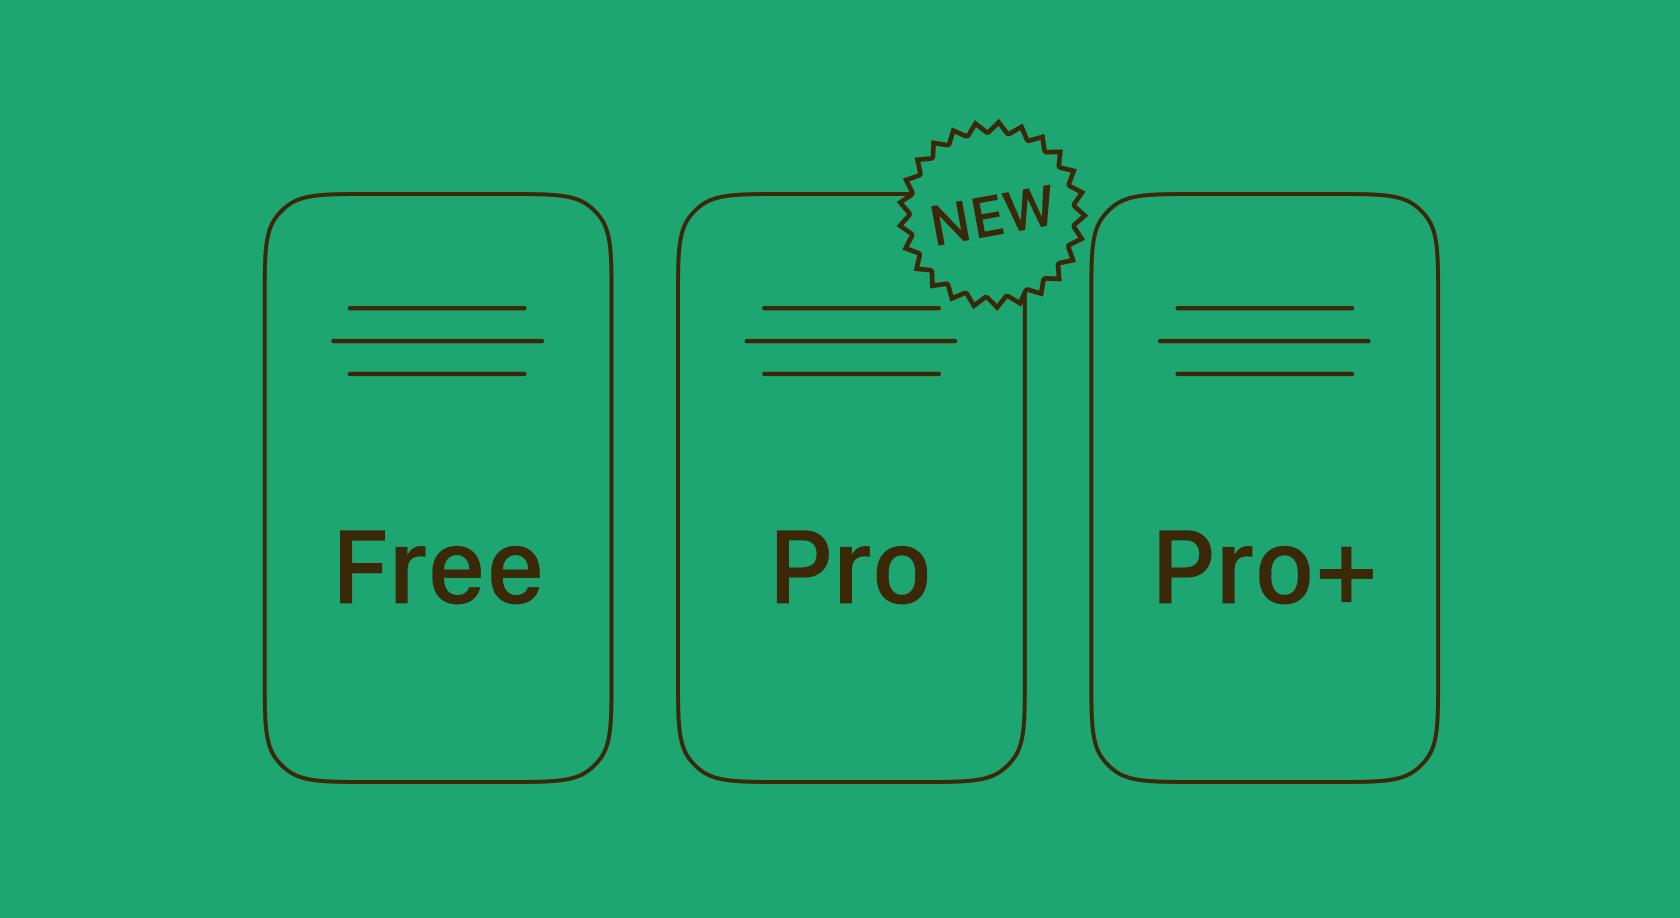 Meet brand new Adapty pricing